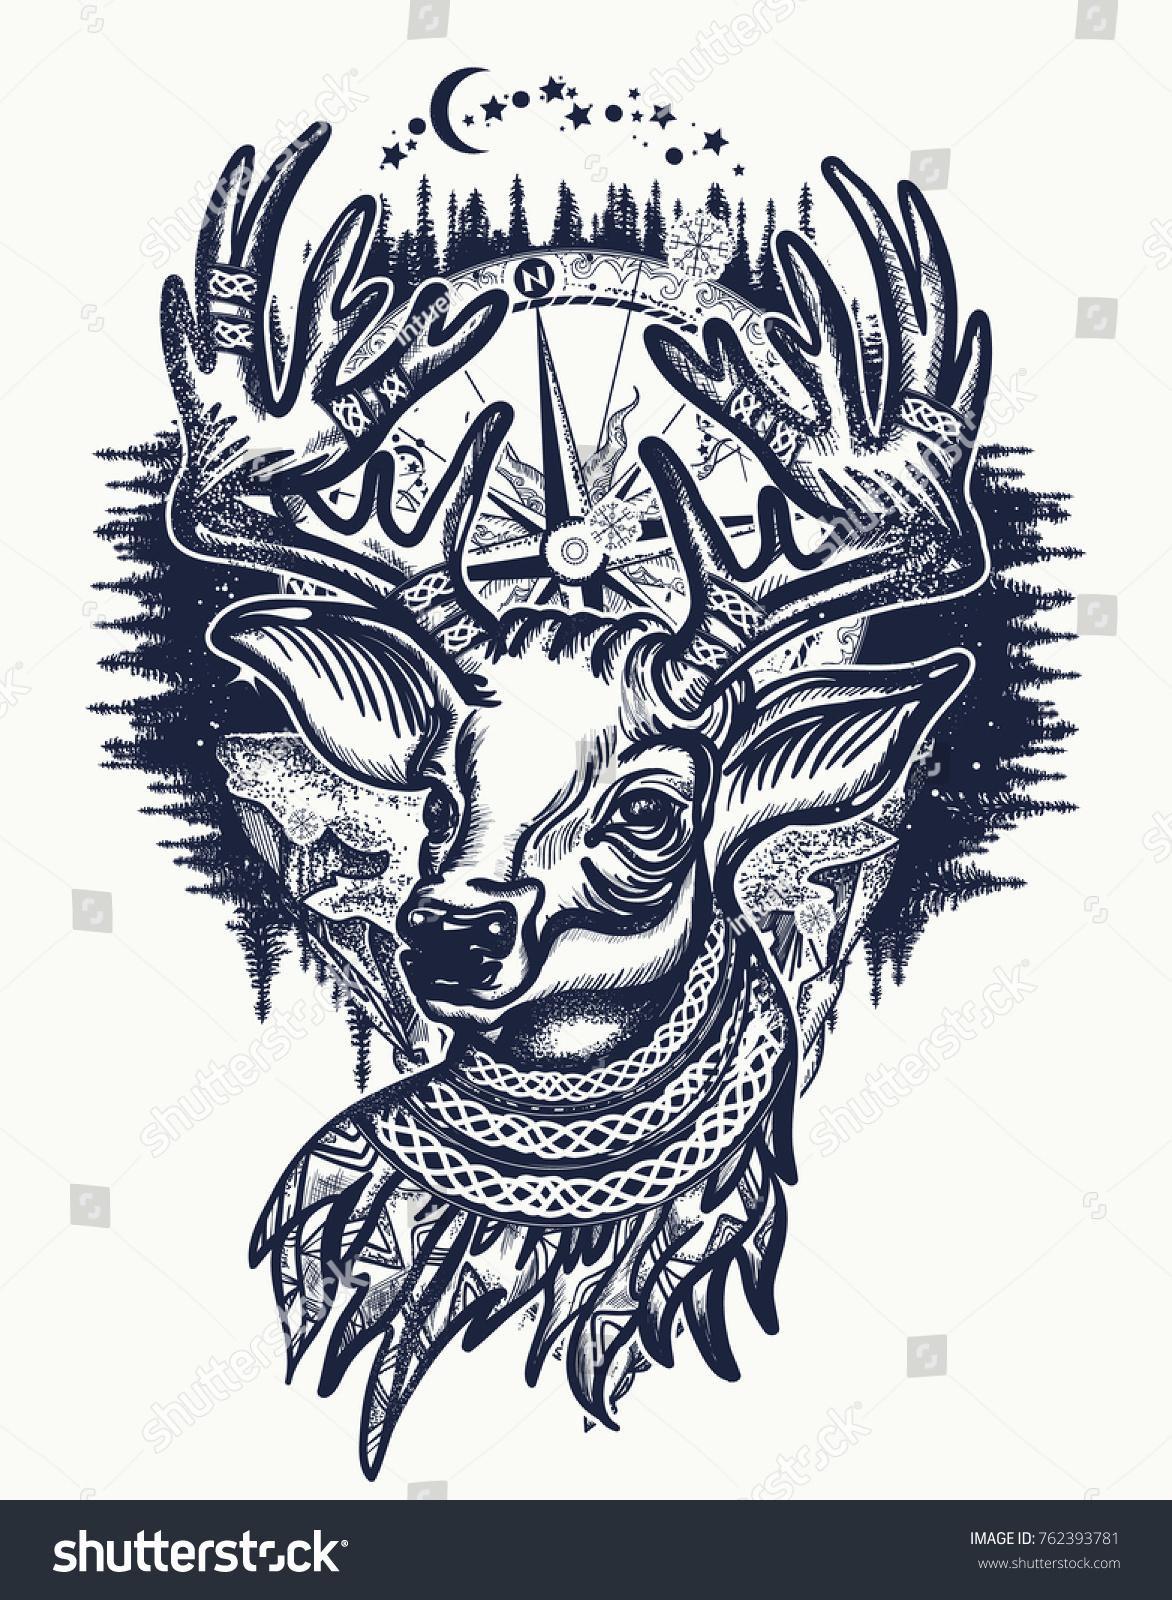 Deer Winter Forest Tattoo Tshirt Design Stock Vector Royalty Free